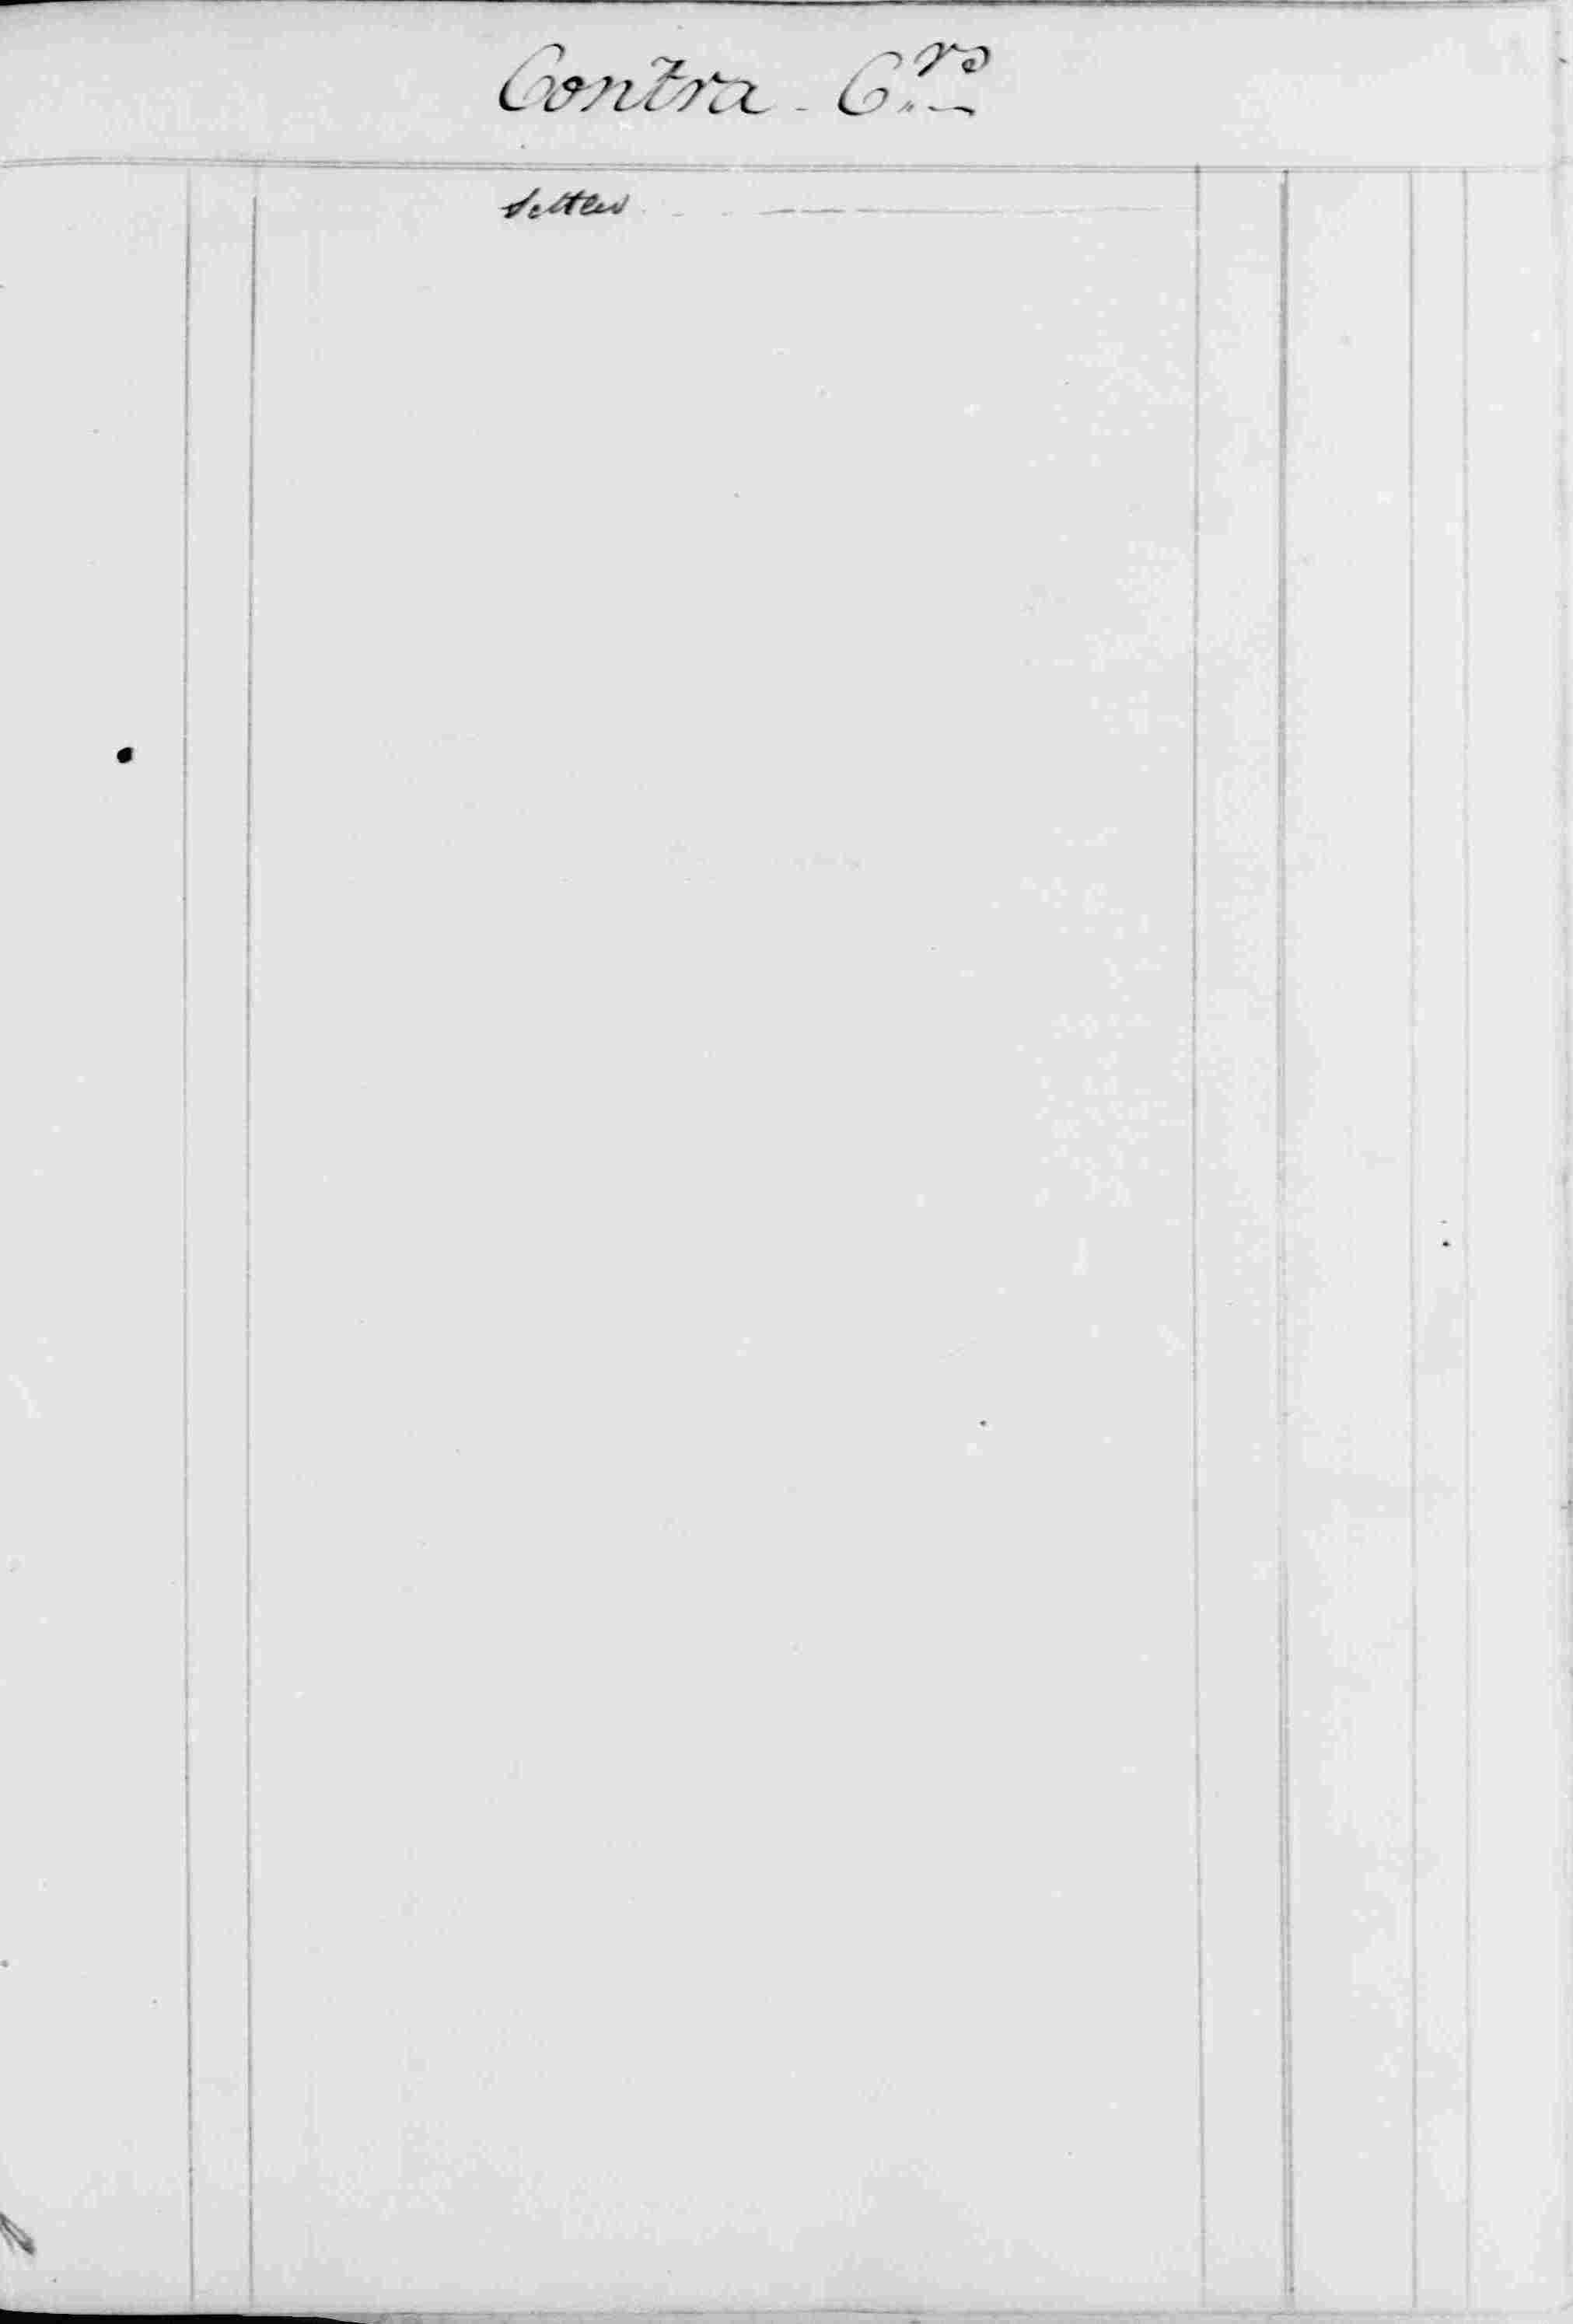 Ledger B, folio 15, side right